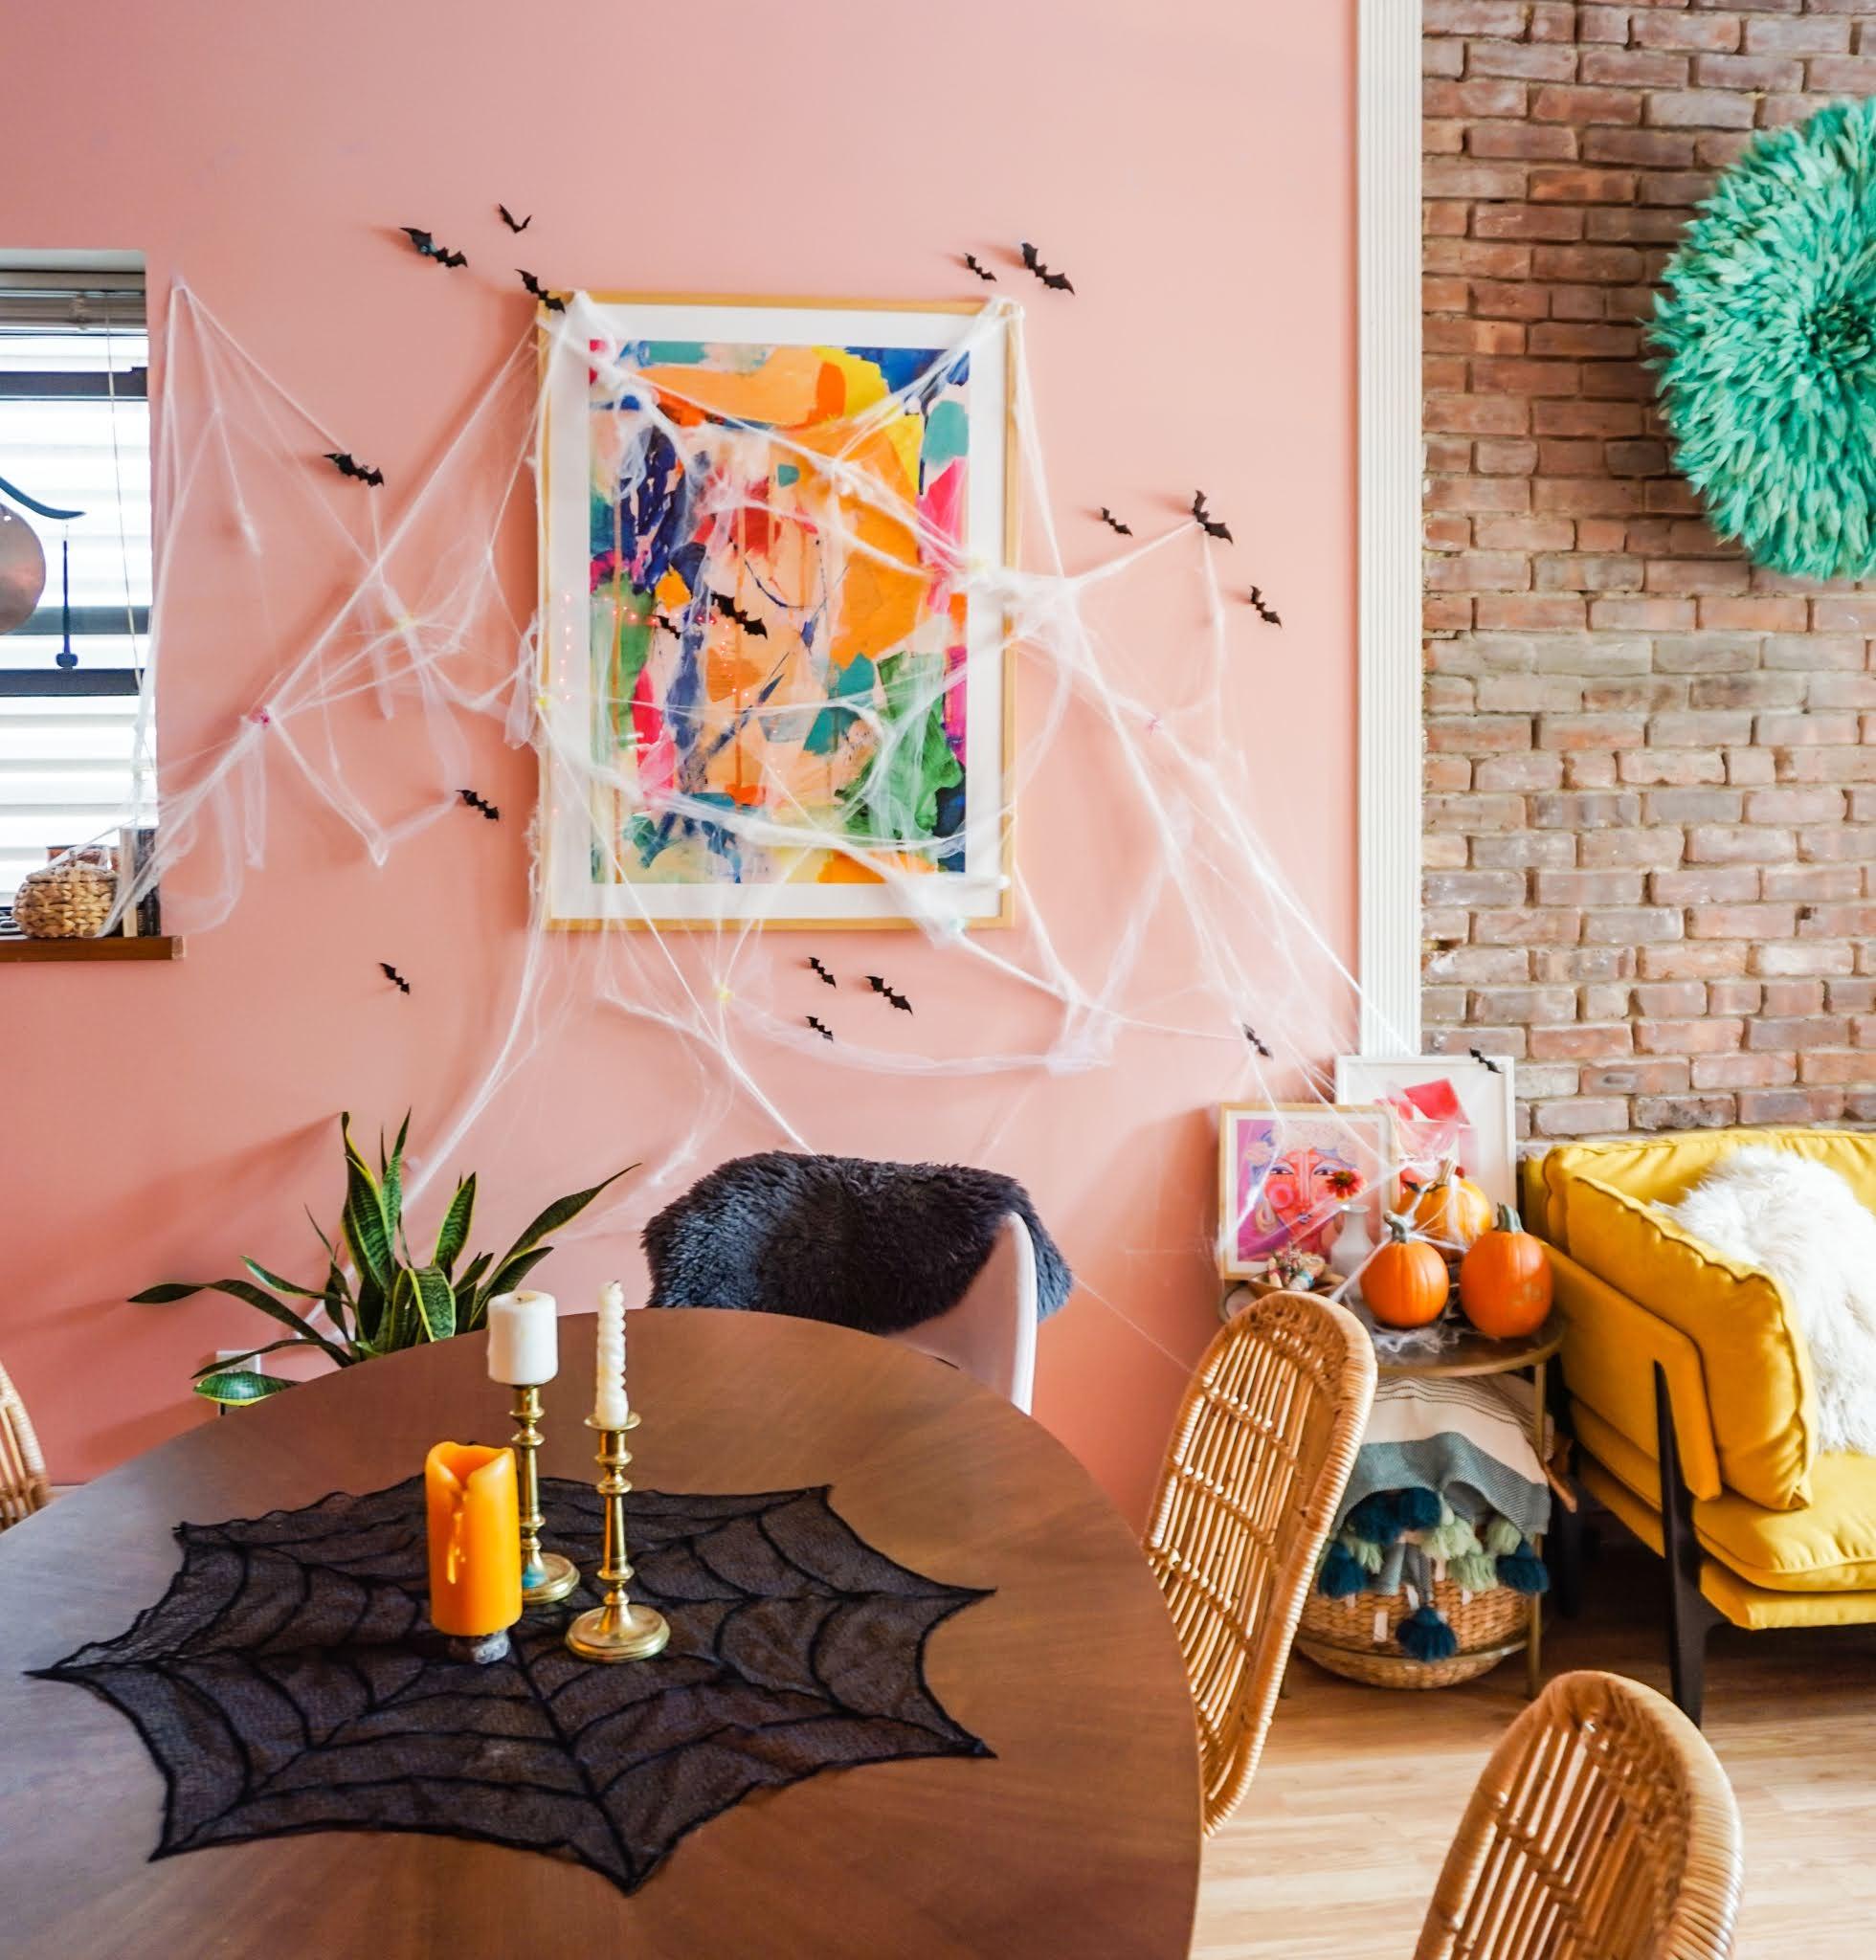 colorful halloween decor // easy halloween decor // halloween decor // halloween bats // halloween cobwebs // halloween tables cape // kid-friendly halloween decor // halloween decor with color // boho halloween decorations // bright and colorful halloween decor // electic  halloween decor // cute halloween decor // color halloween decor // tiny bats halloween decor // how to decorate for halloween in 2020 // simple halloween decorations